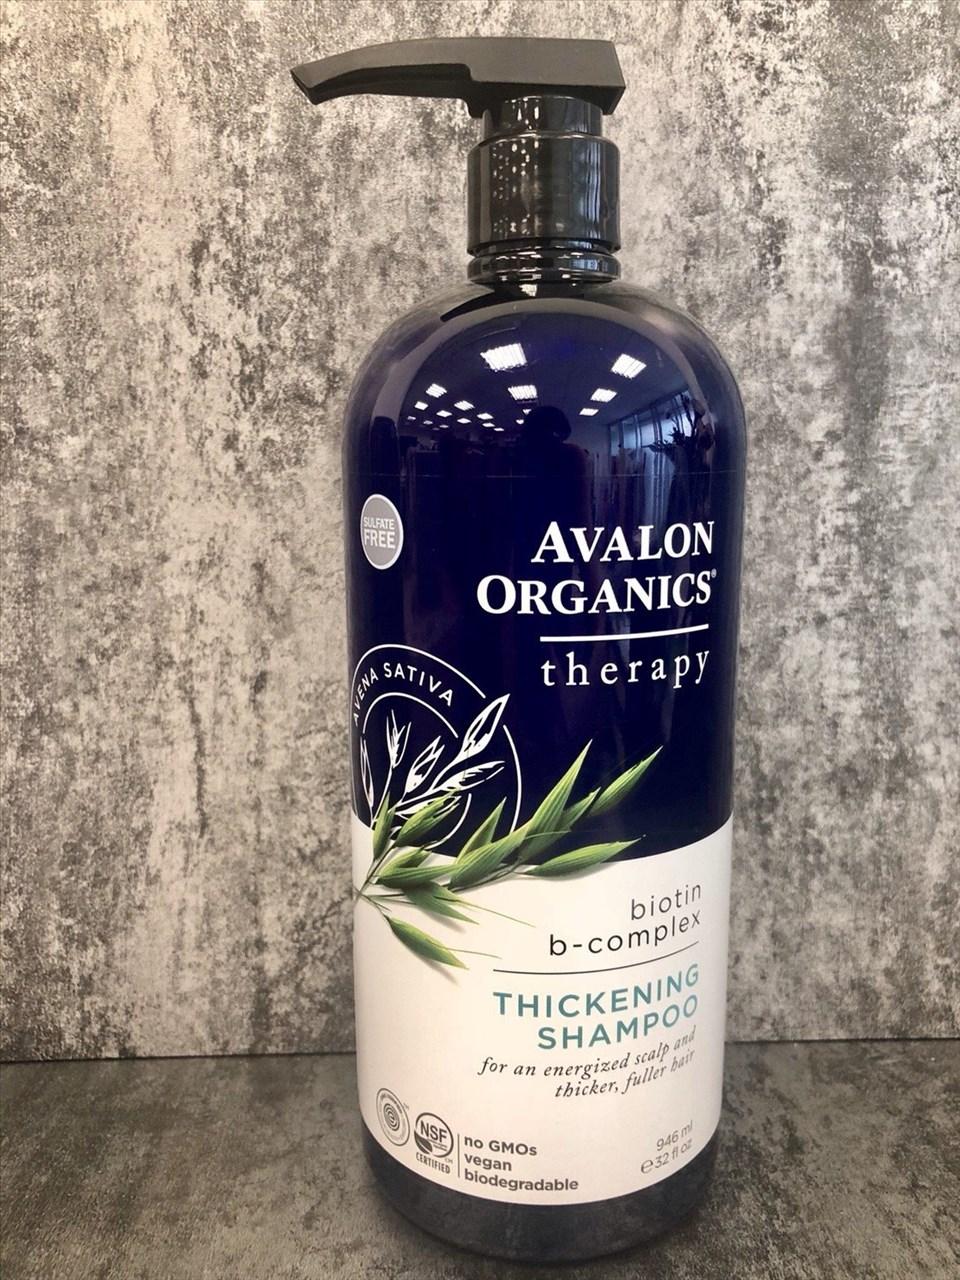 AVALON 綠康 湛藍 生物素B群 大容量 946ml 洗髮精//潤髮乳◐香水綁馬尾◐